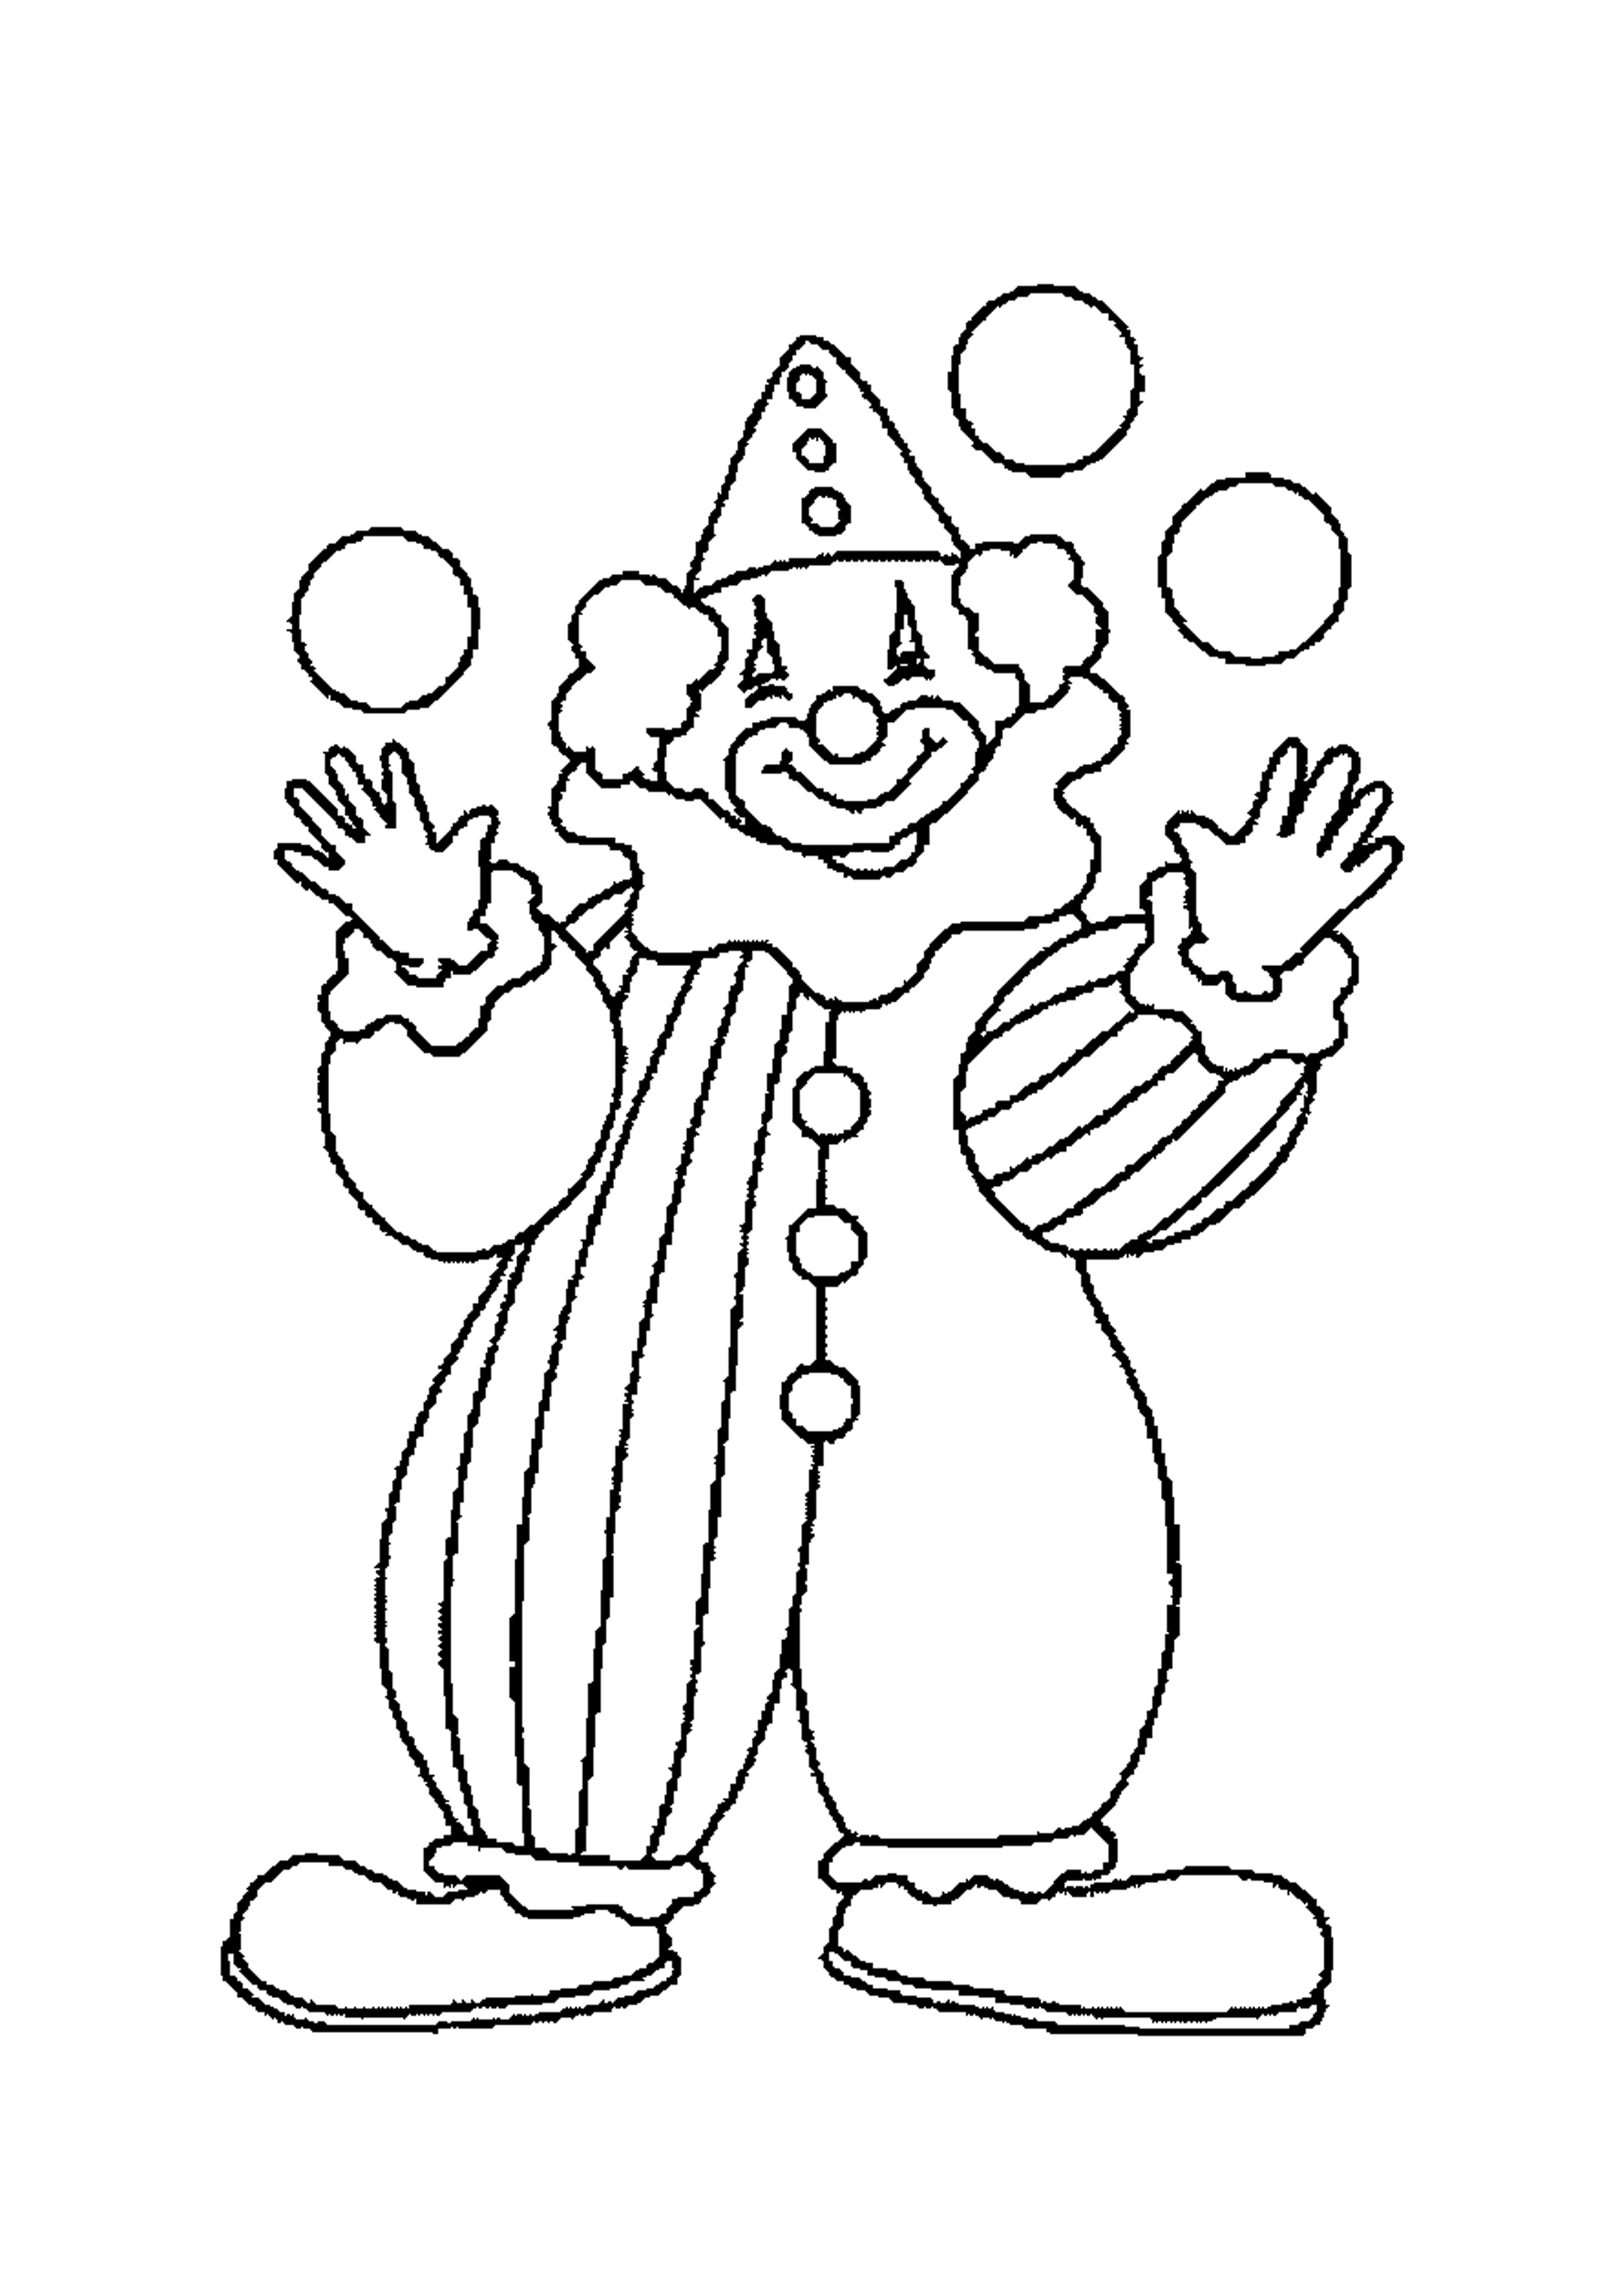 Dibujos para Colorear de personajes de circo | Malabart - Revista ...